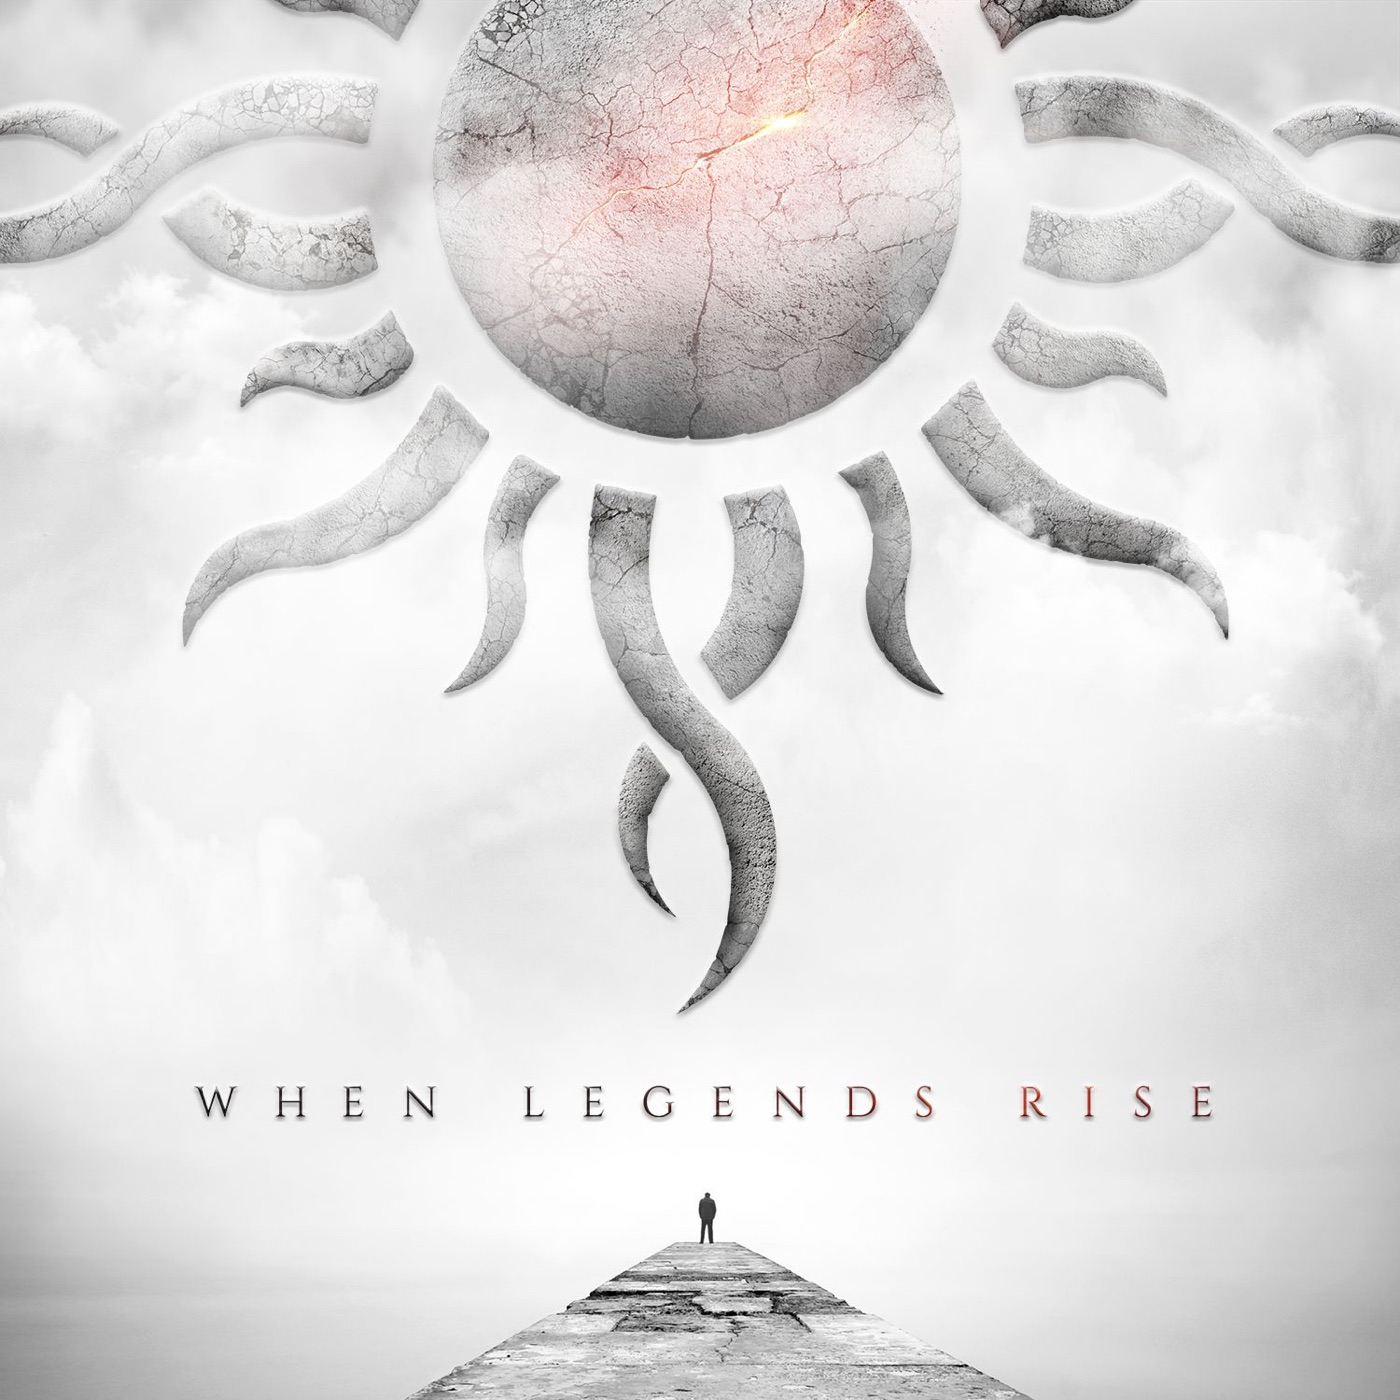 Godsmack - When Legends Rise [Single] (2018)